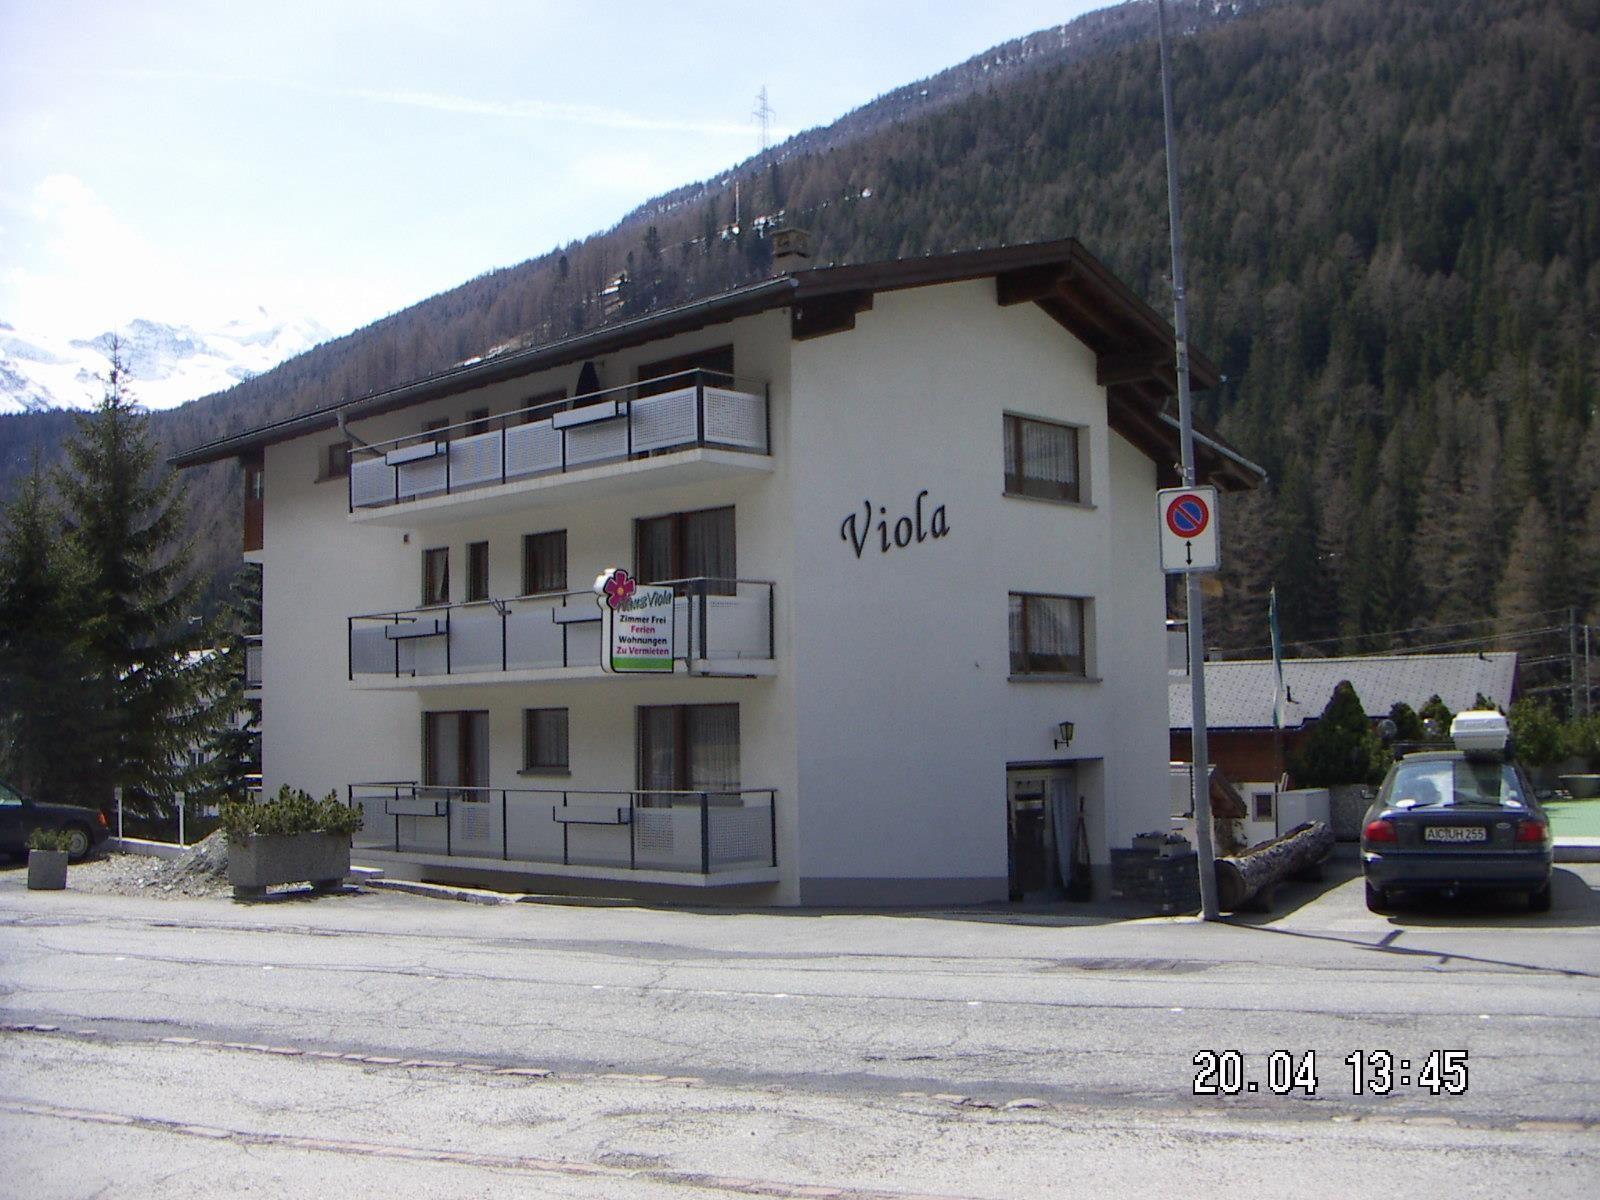 Haus Viola